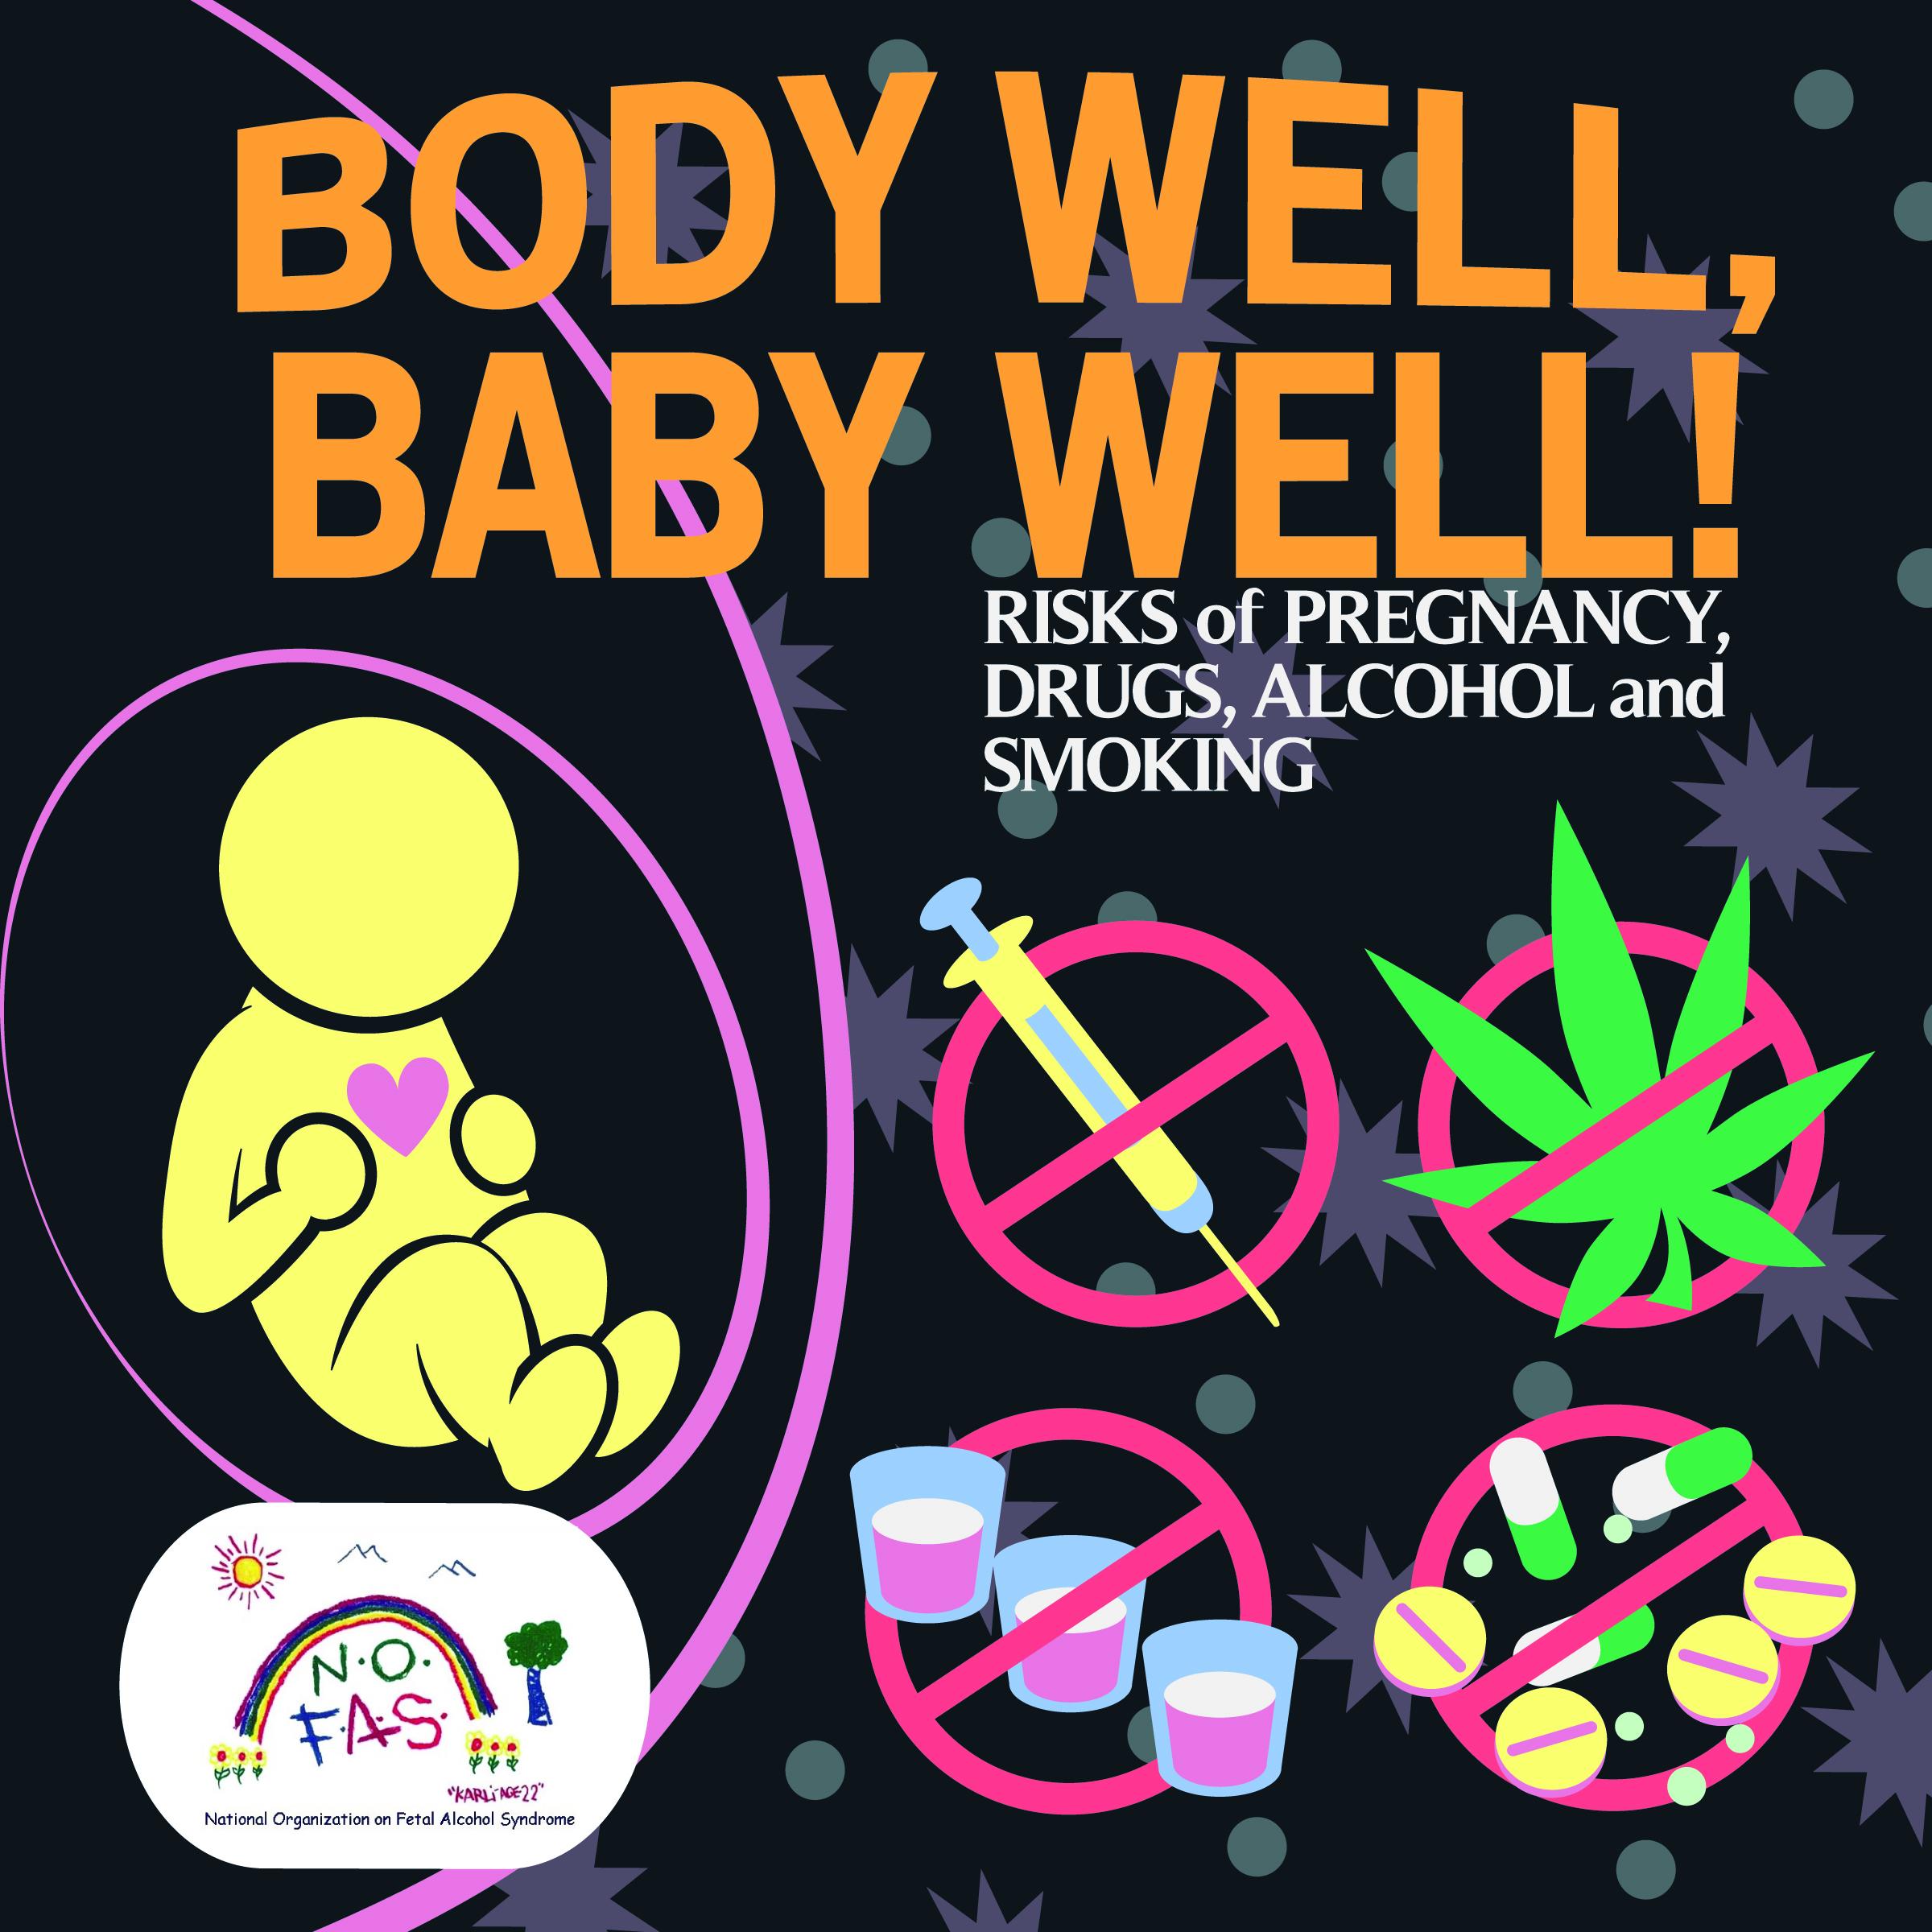 Body Well, Baby Well!